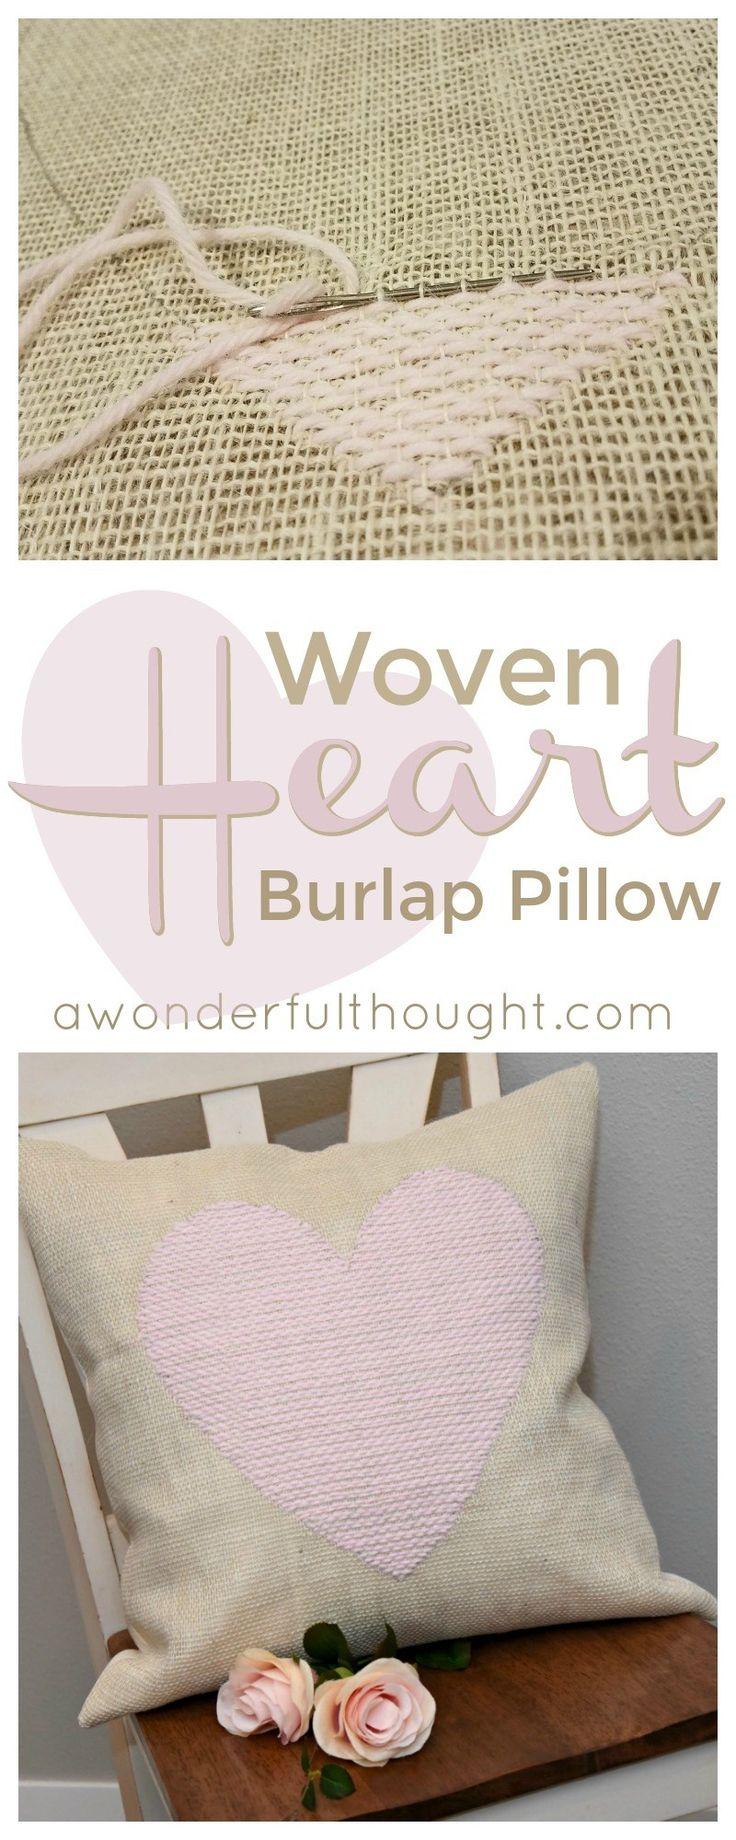 DIY Woven Heart Burlap Pillow | awonderfulthought.com